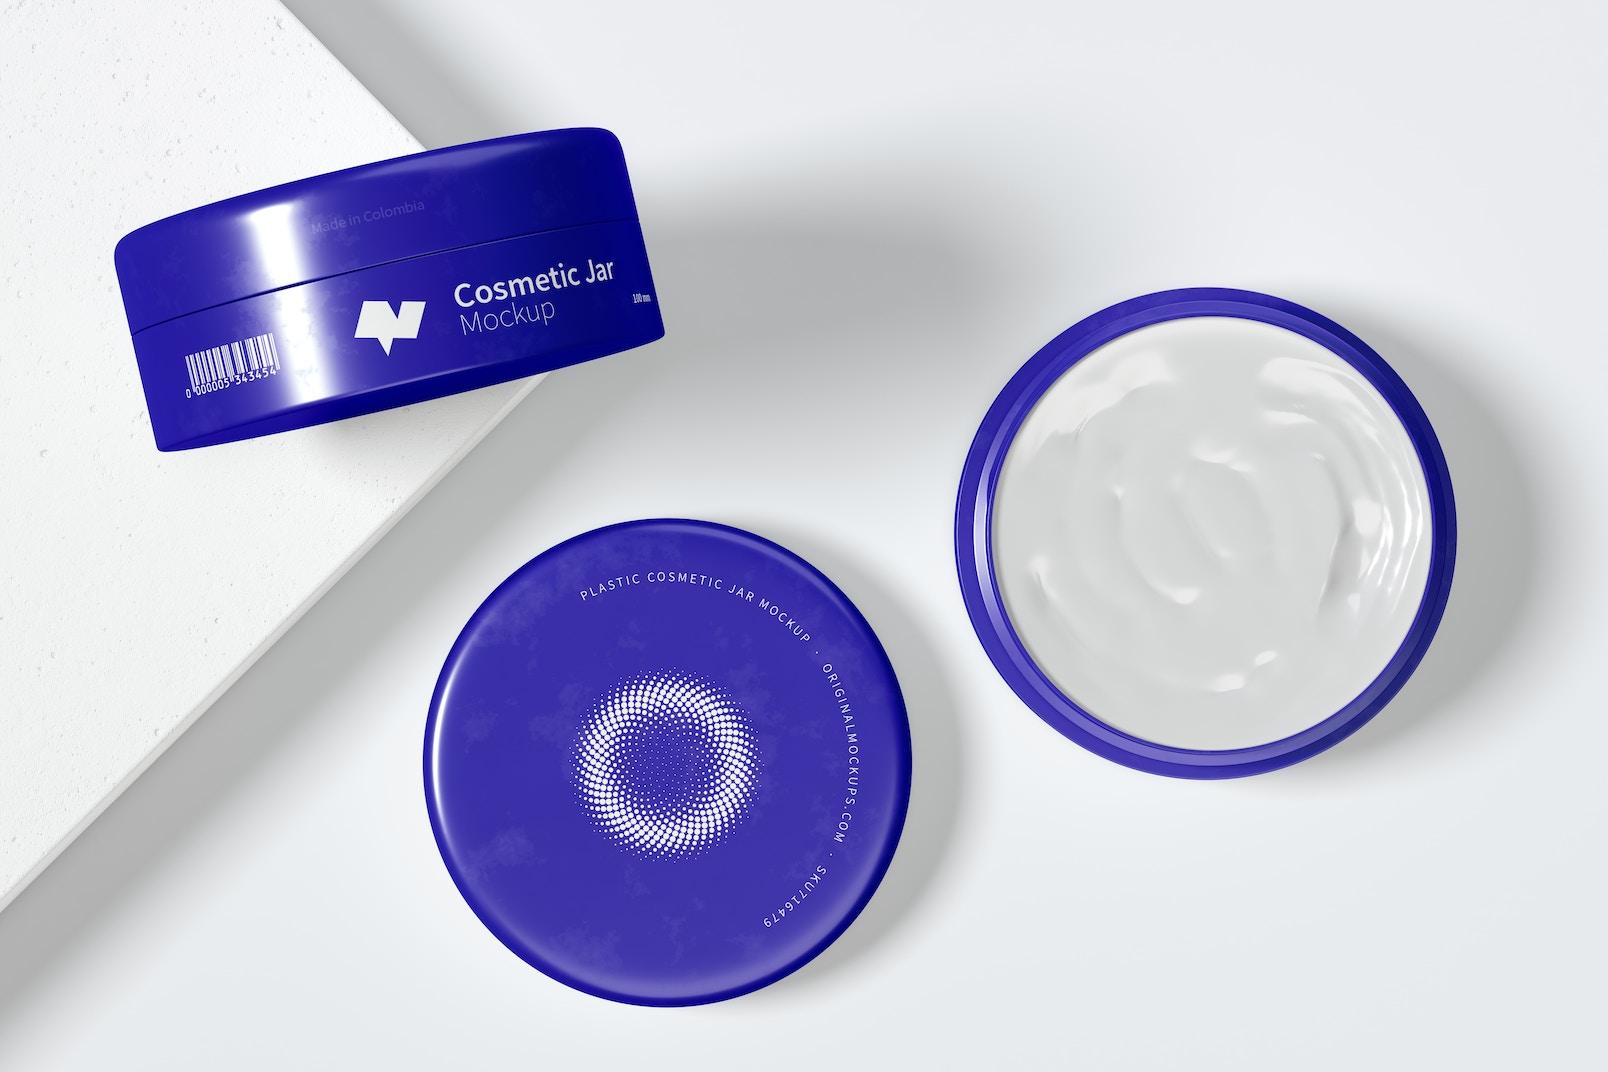 100mm Plastic Cosmetic Jars Mockup, Top View 02